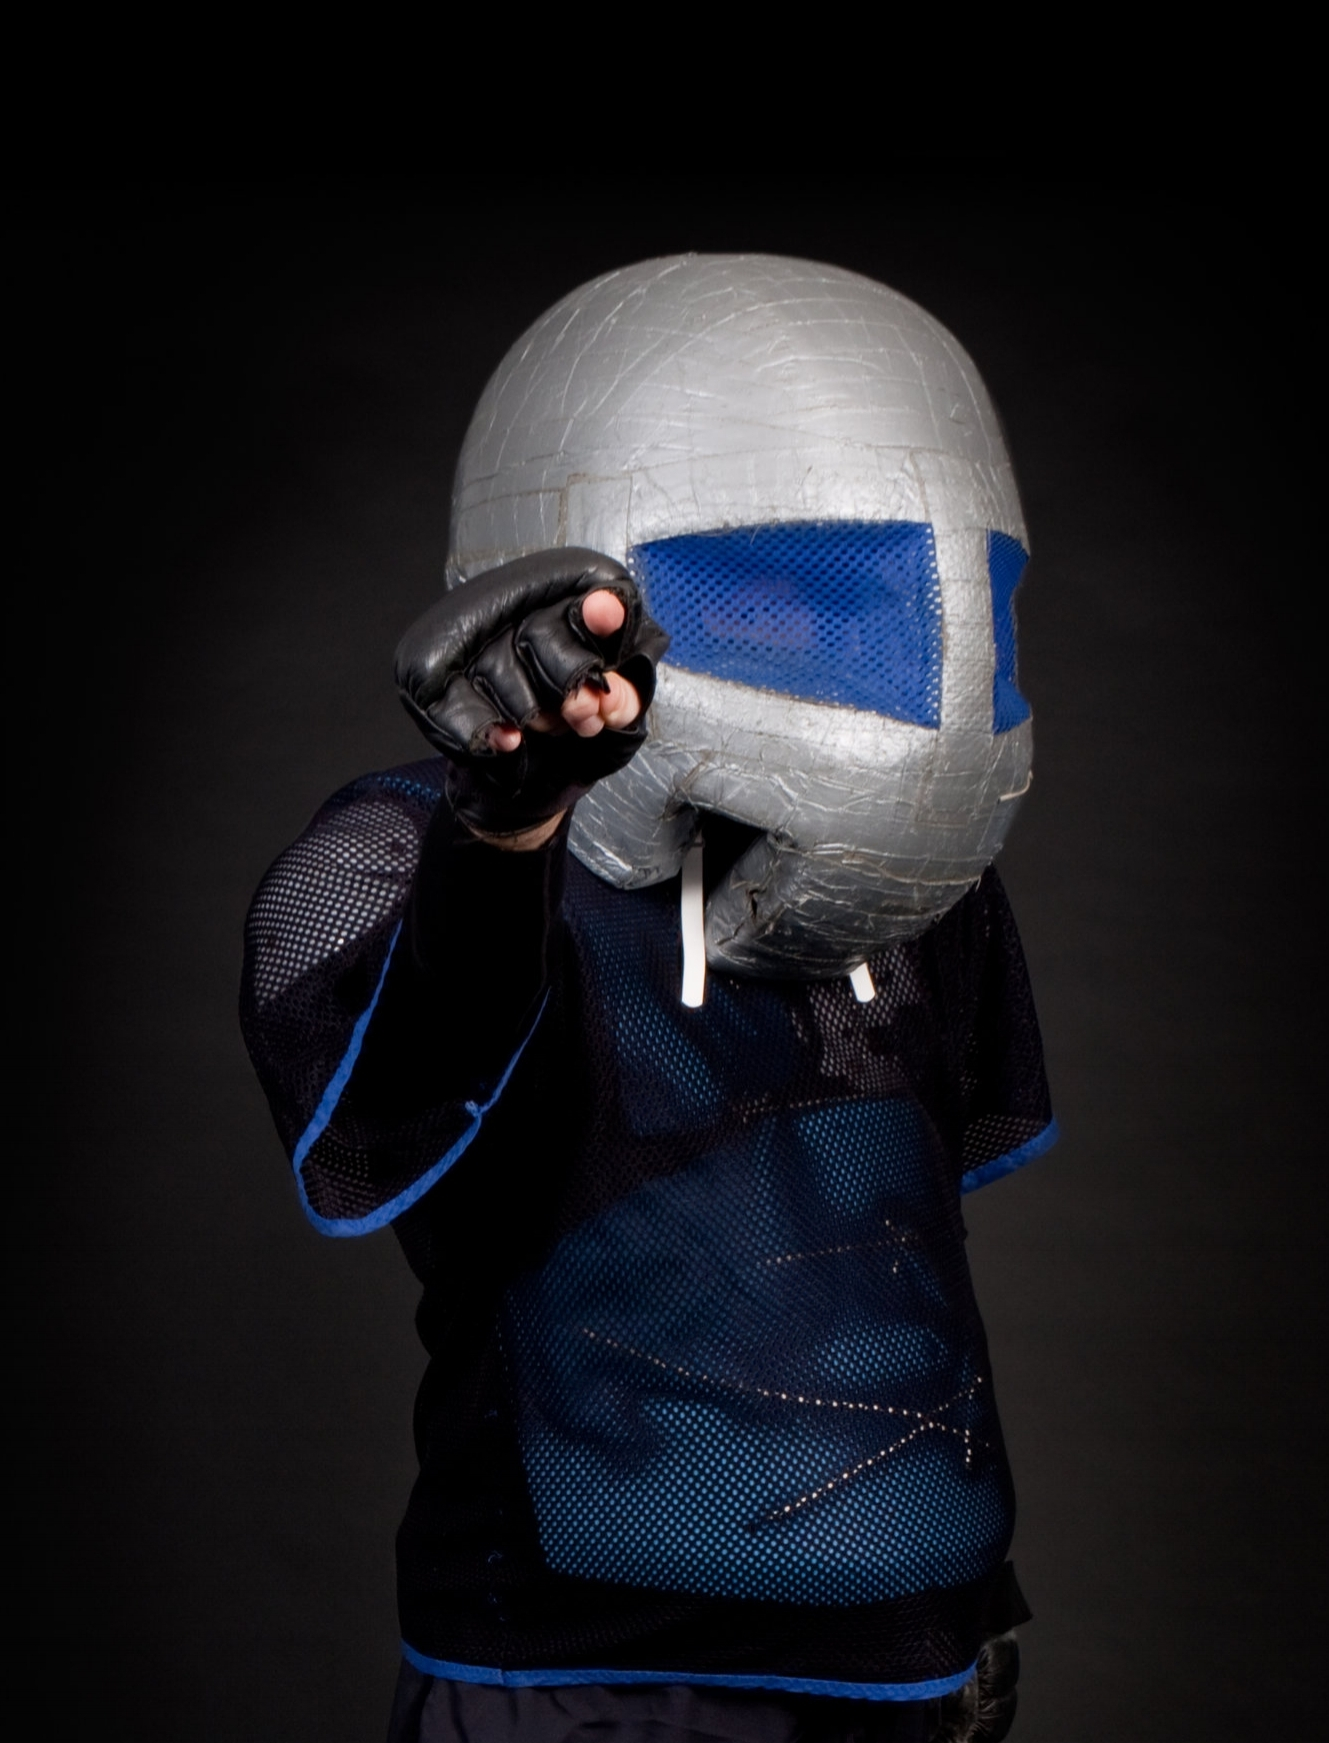 kickboxing_28.10.09_0278.jpg